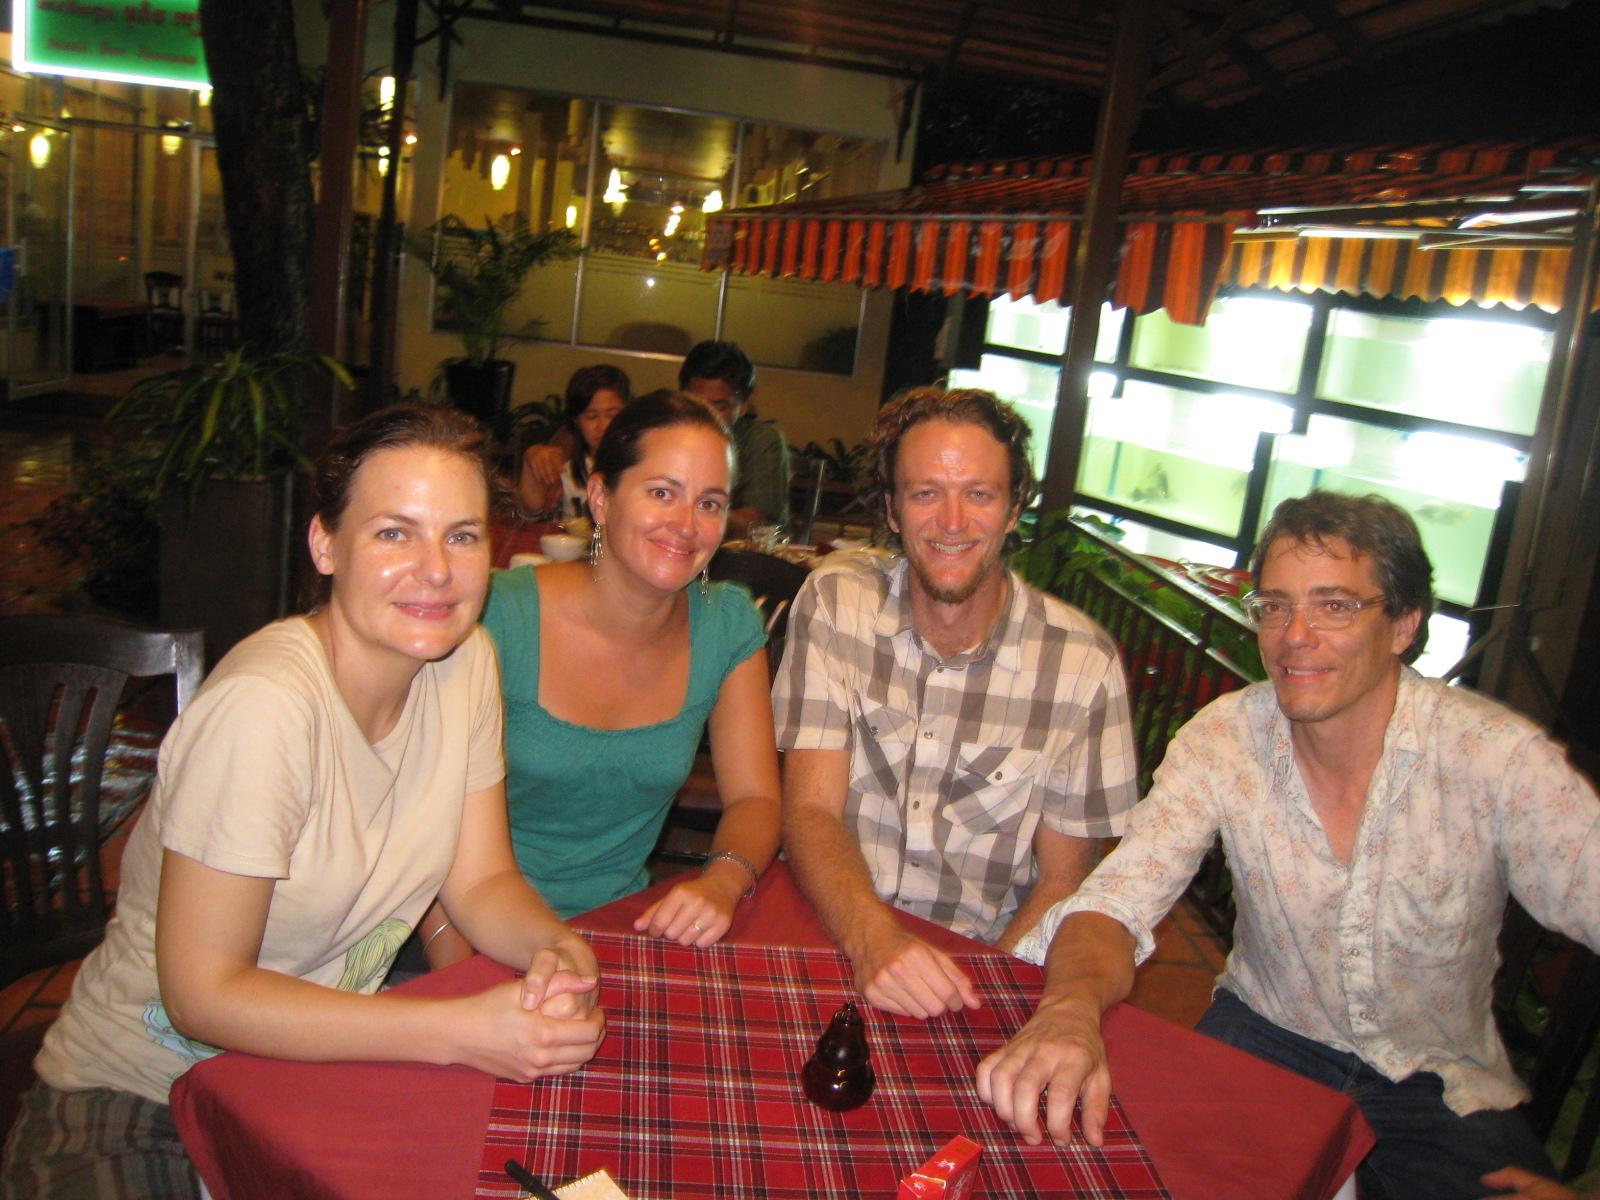 Teresa, Erica, Joe, and John